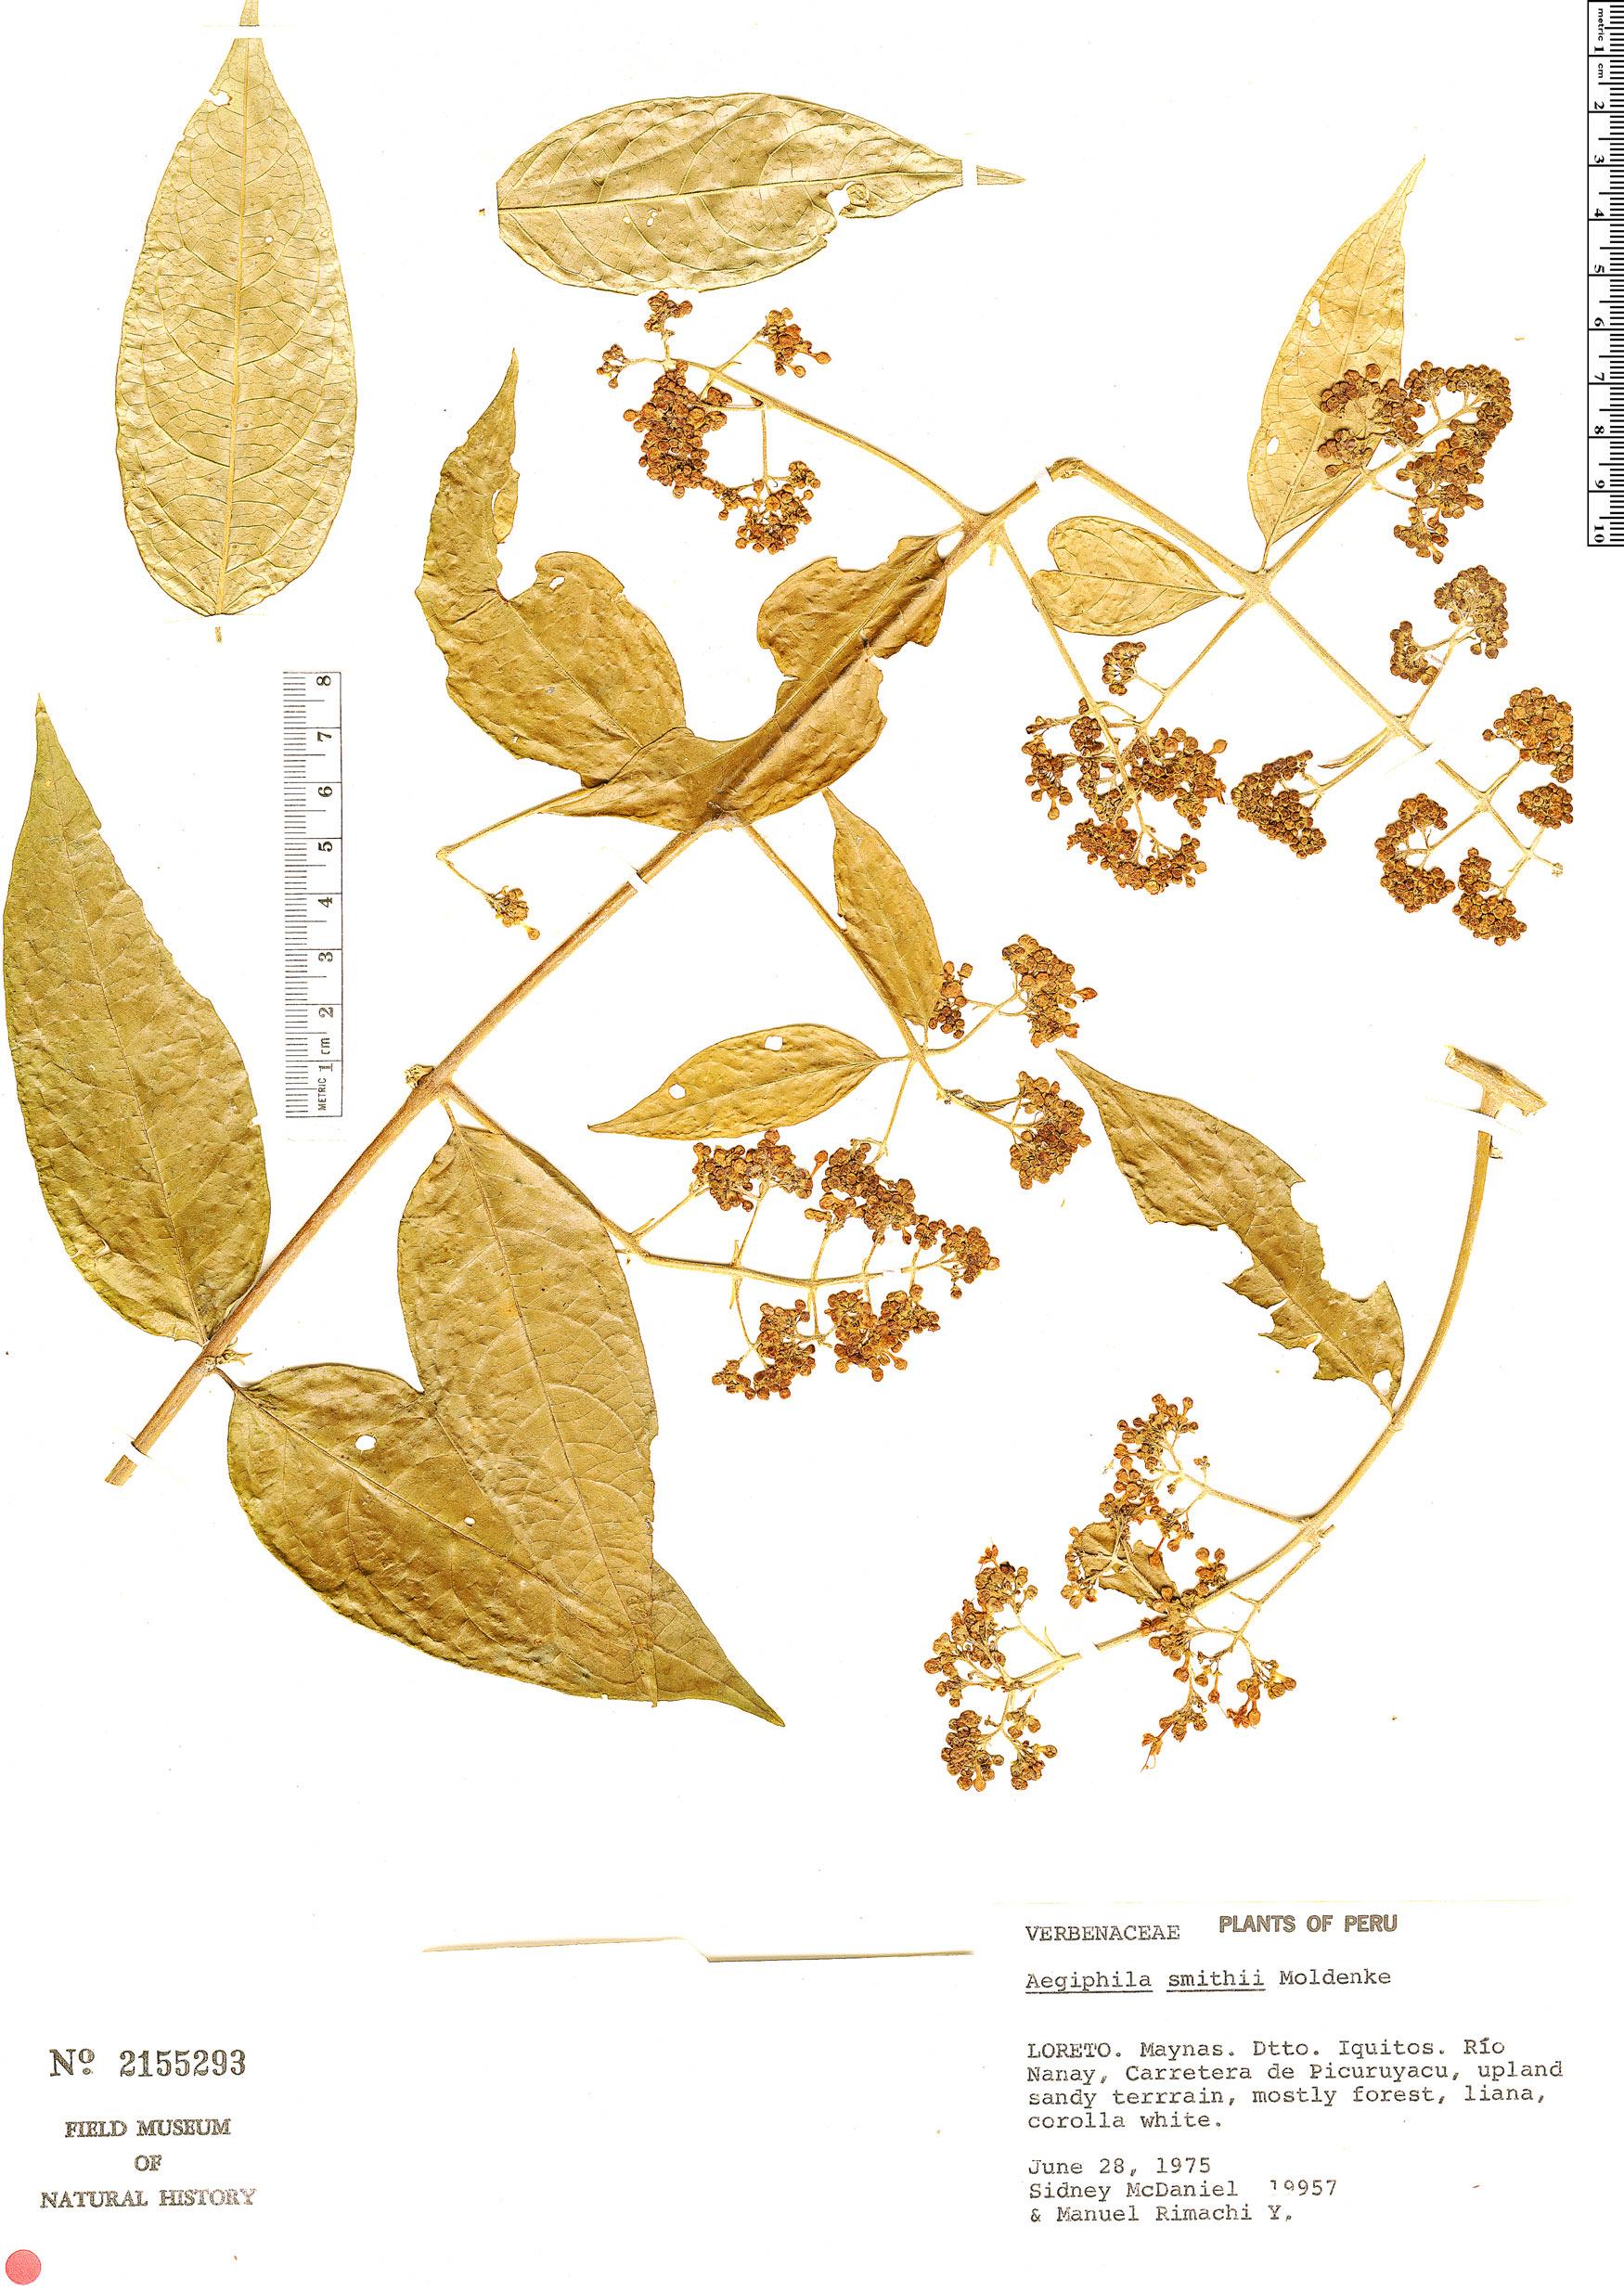 Specimen: Aegiphila smithii